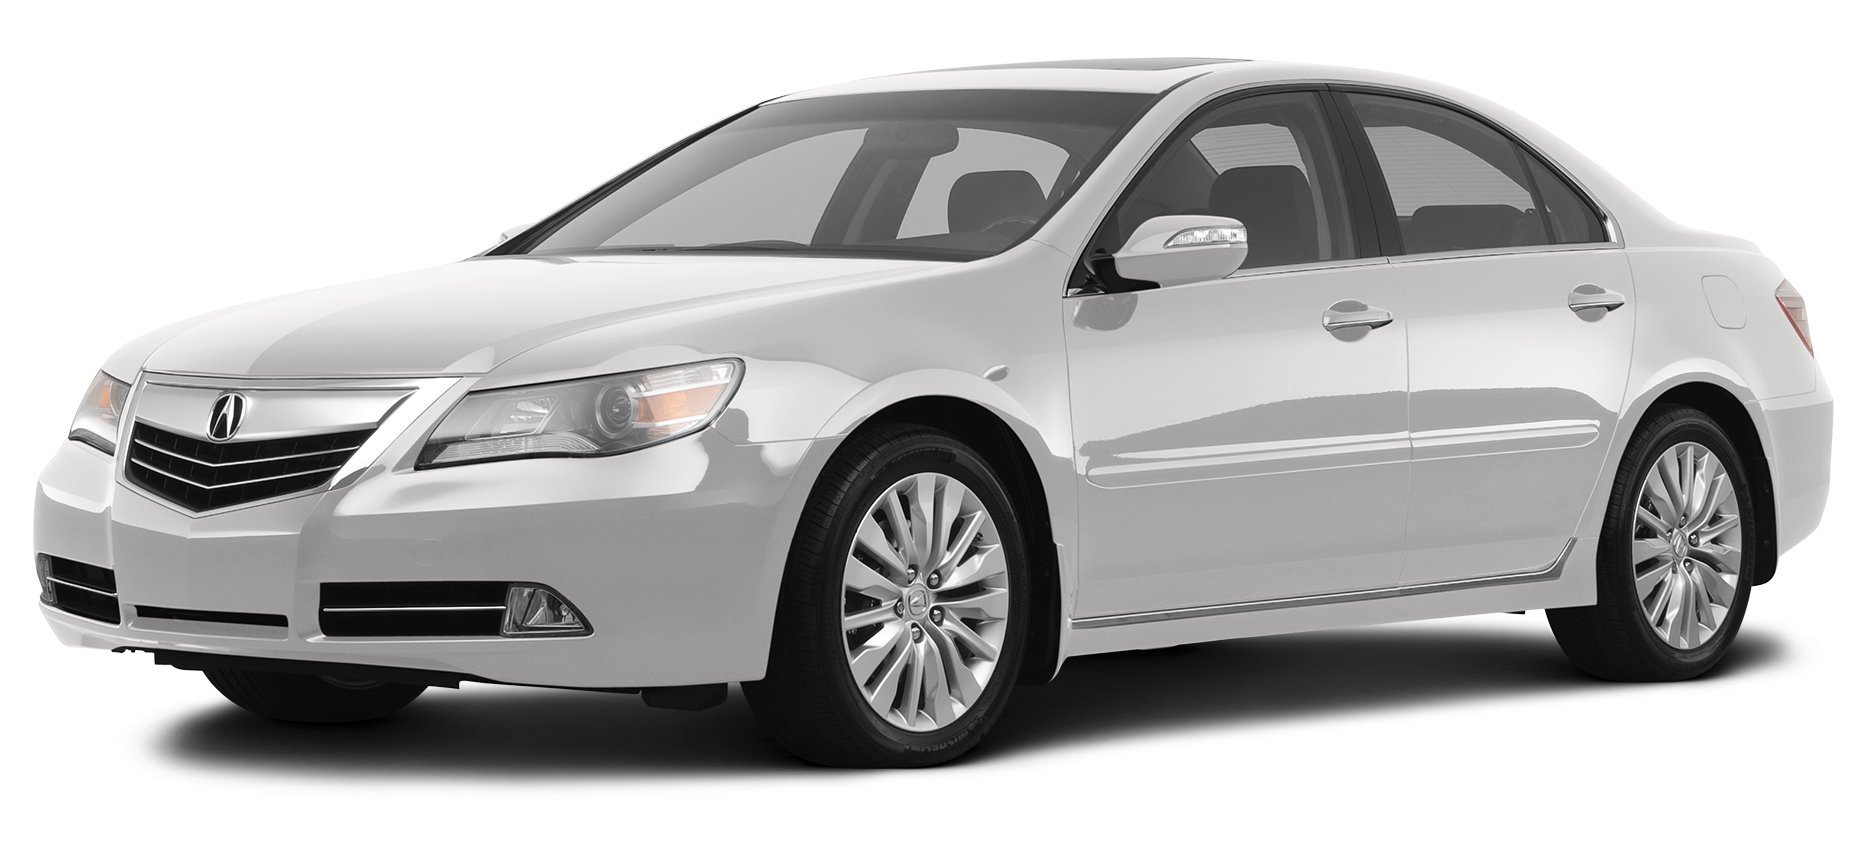 2012 Acura RL, 4-Door Sedan ...